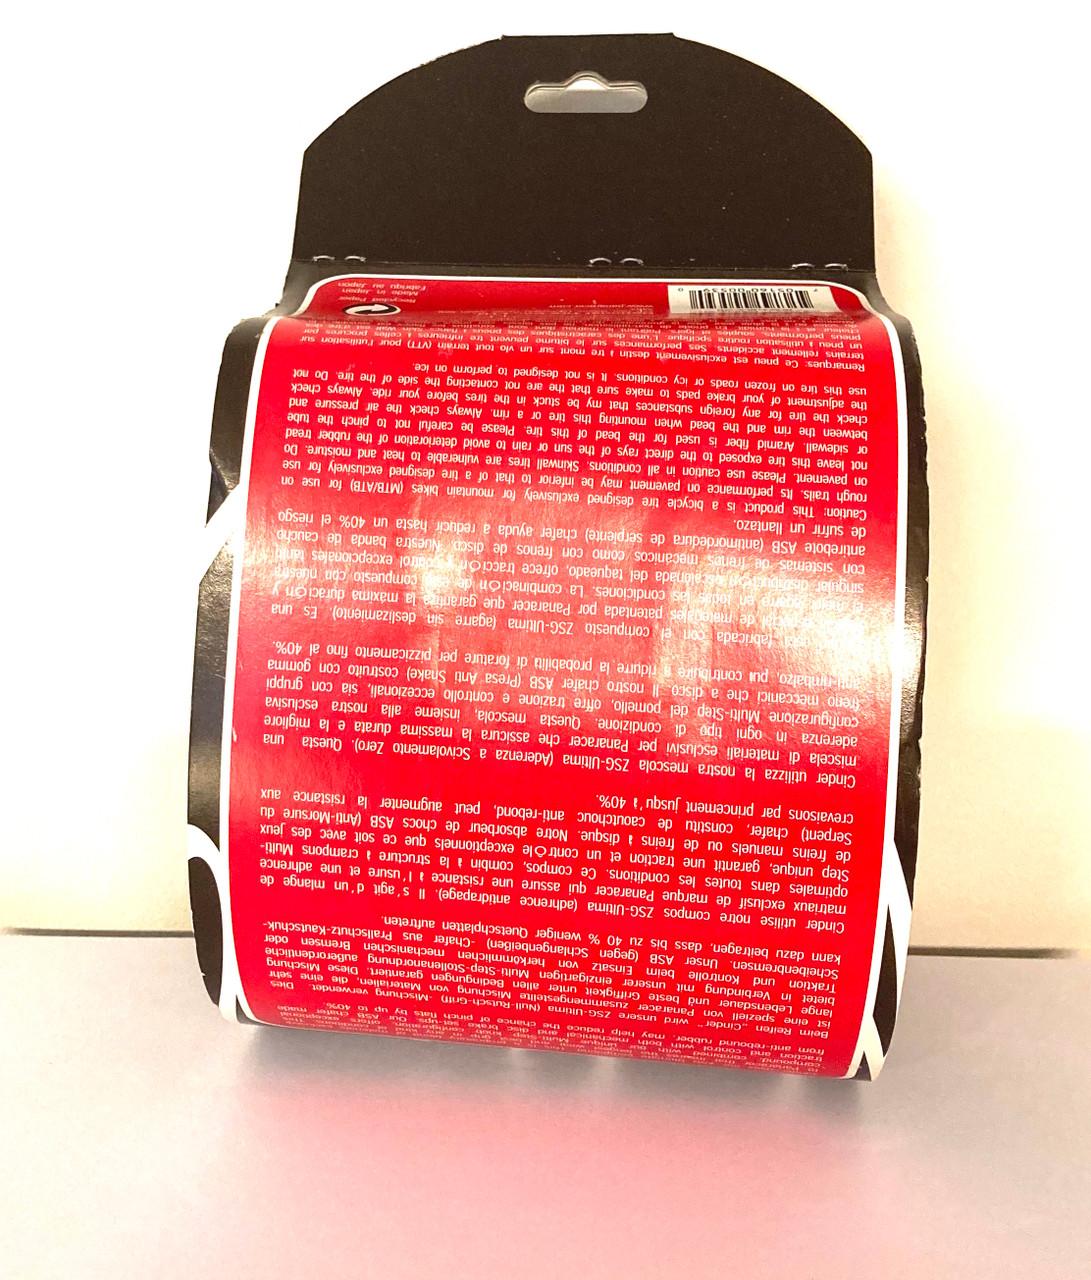 Panaracer Cinder Retro MTB Off Road Folding Tyre 26 x 2.10 In Black Tube Only